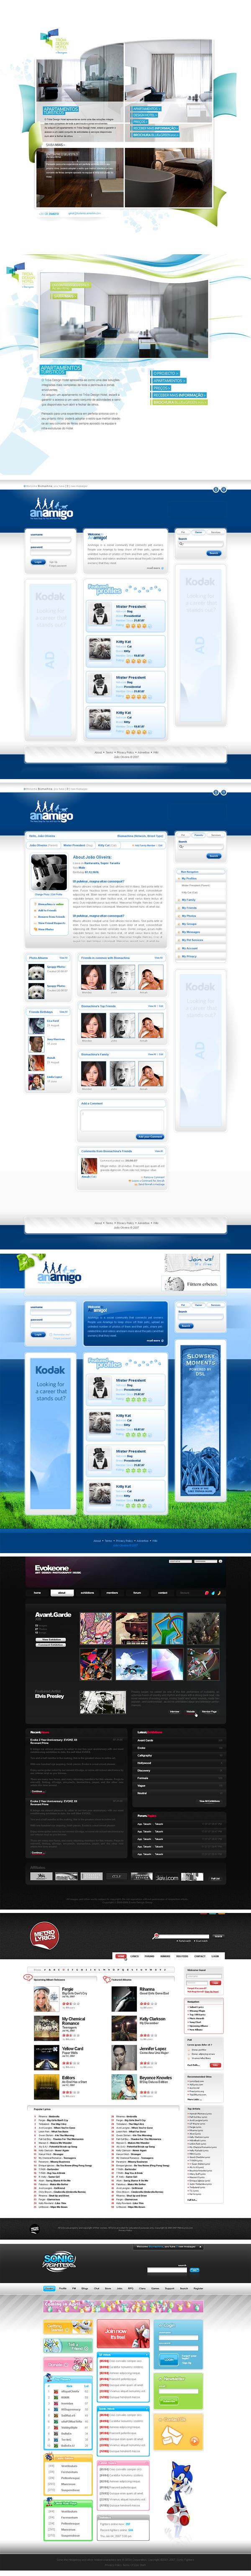 Web Design 07-08 by onrepeattt